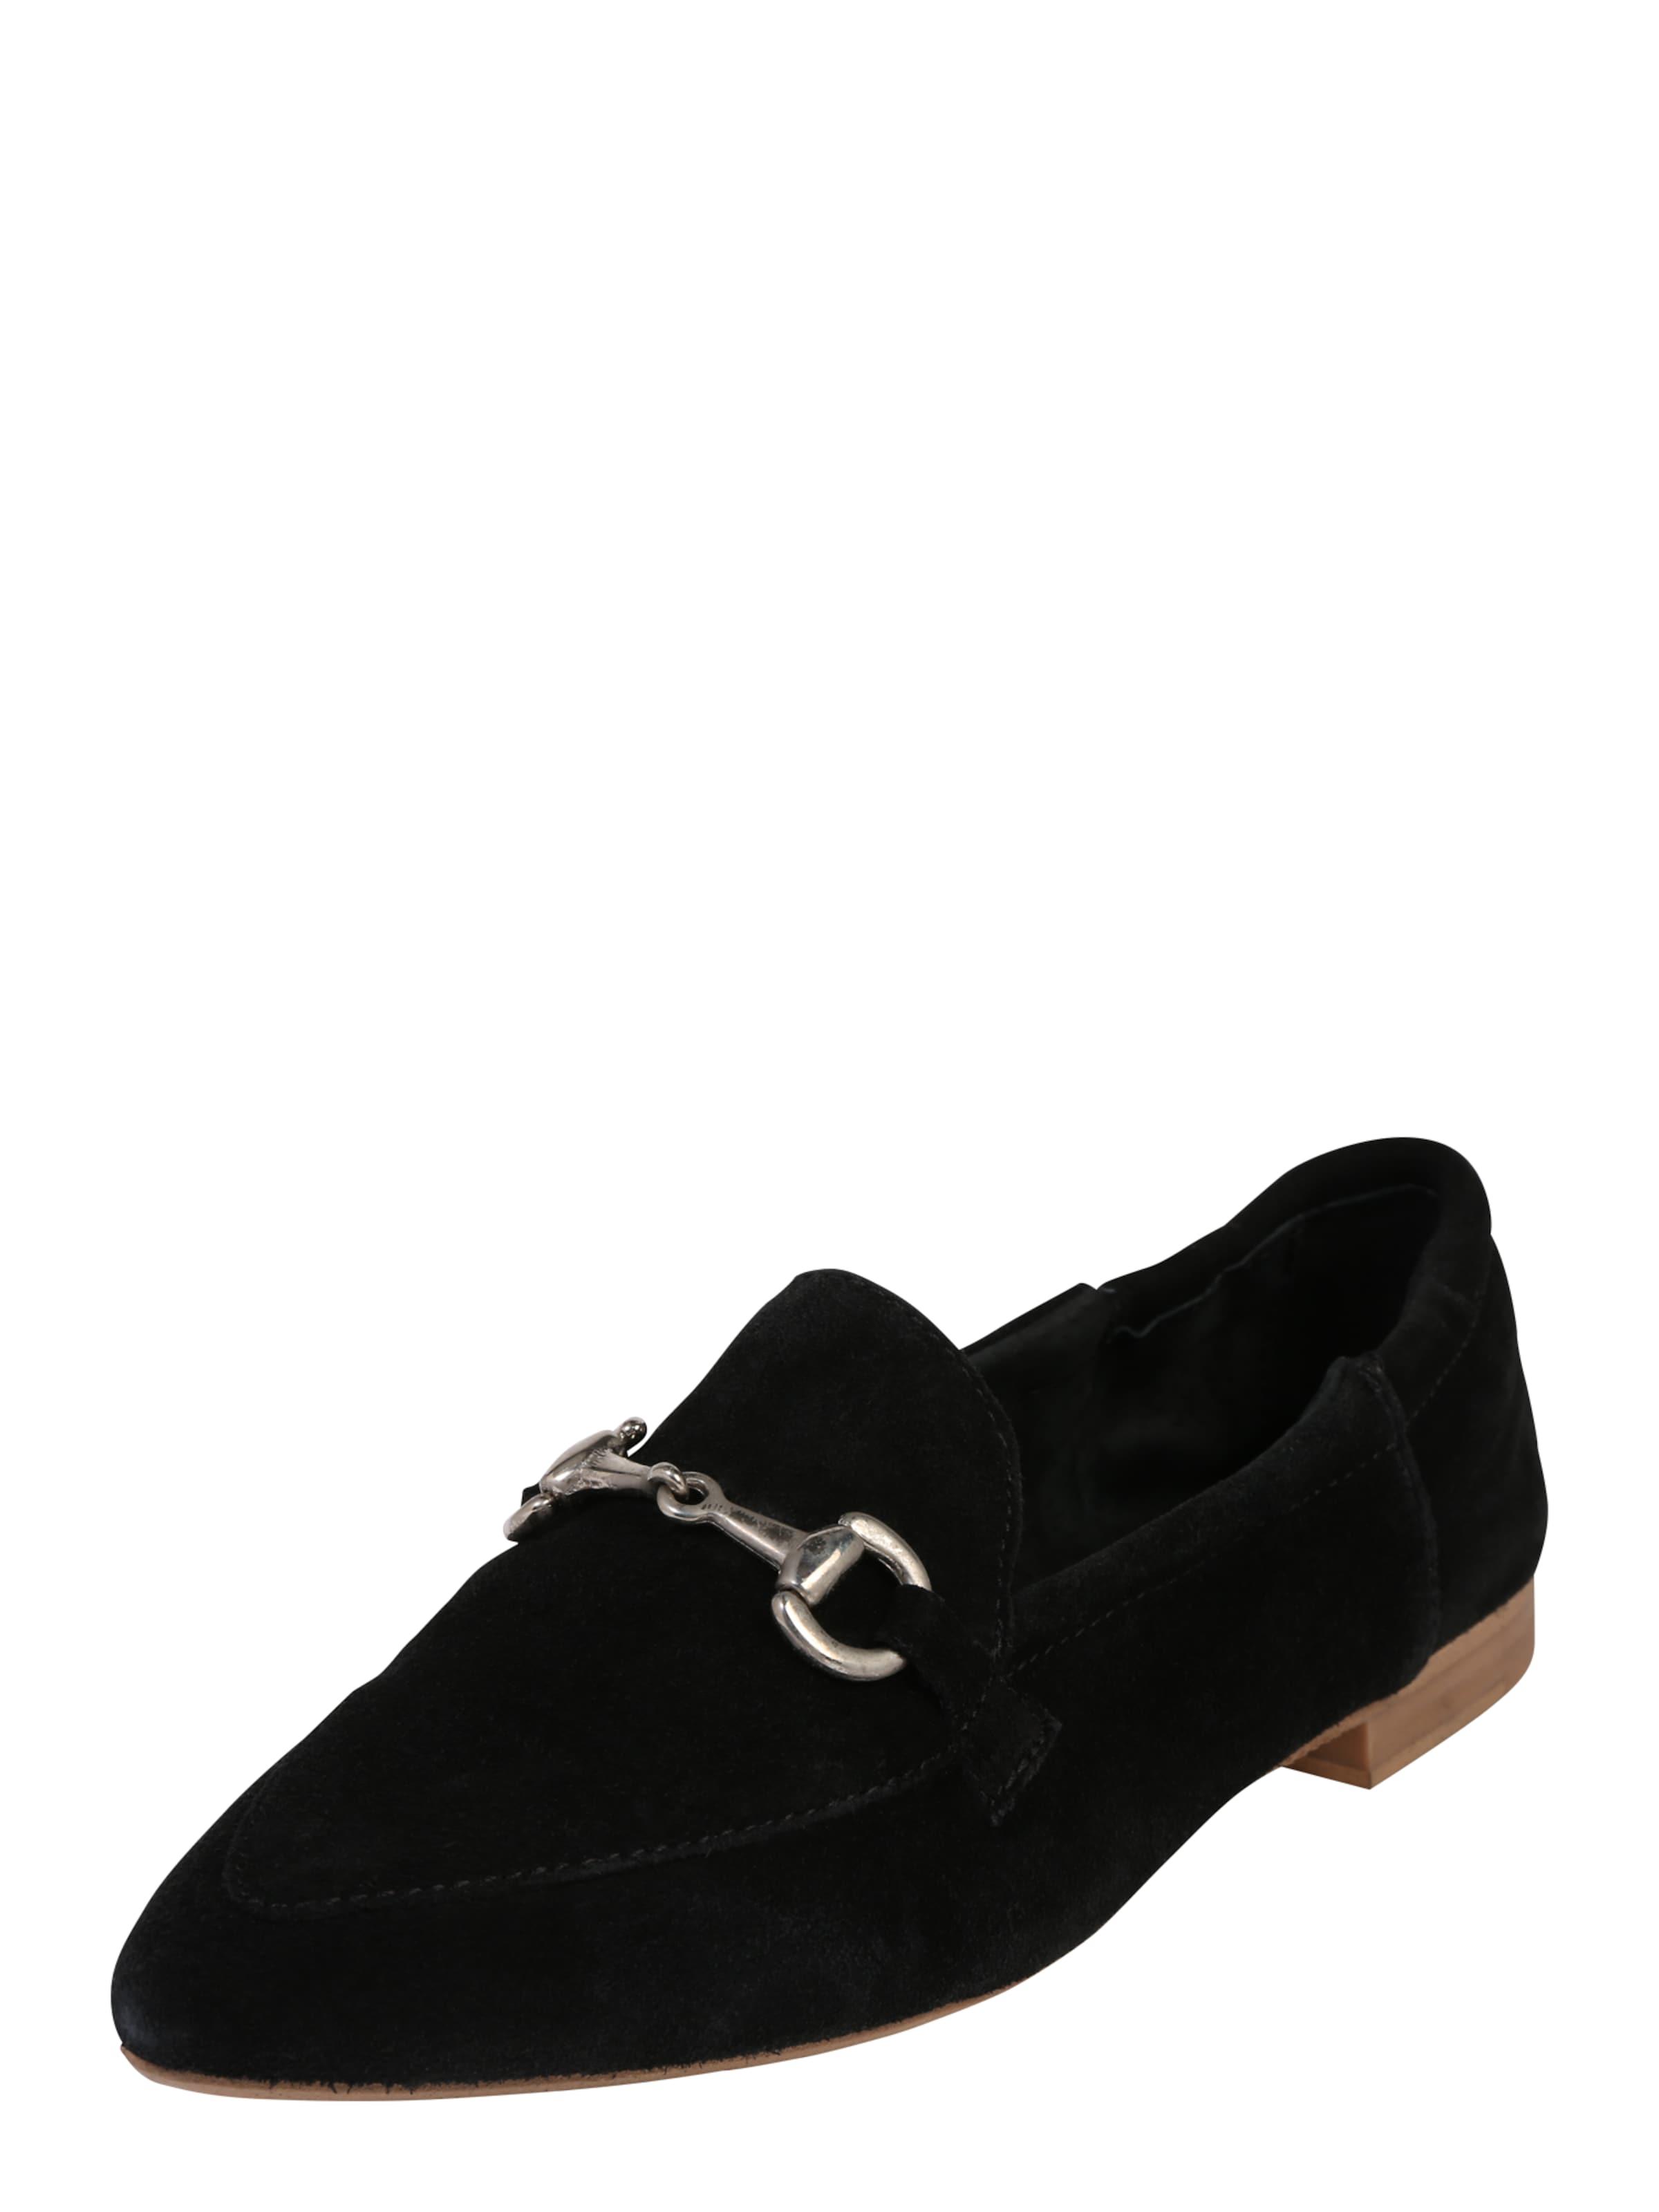 PAVEMENT Loafer 'Jasmin buckle' Kaufen Zum Verkauf 8tvPsja